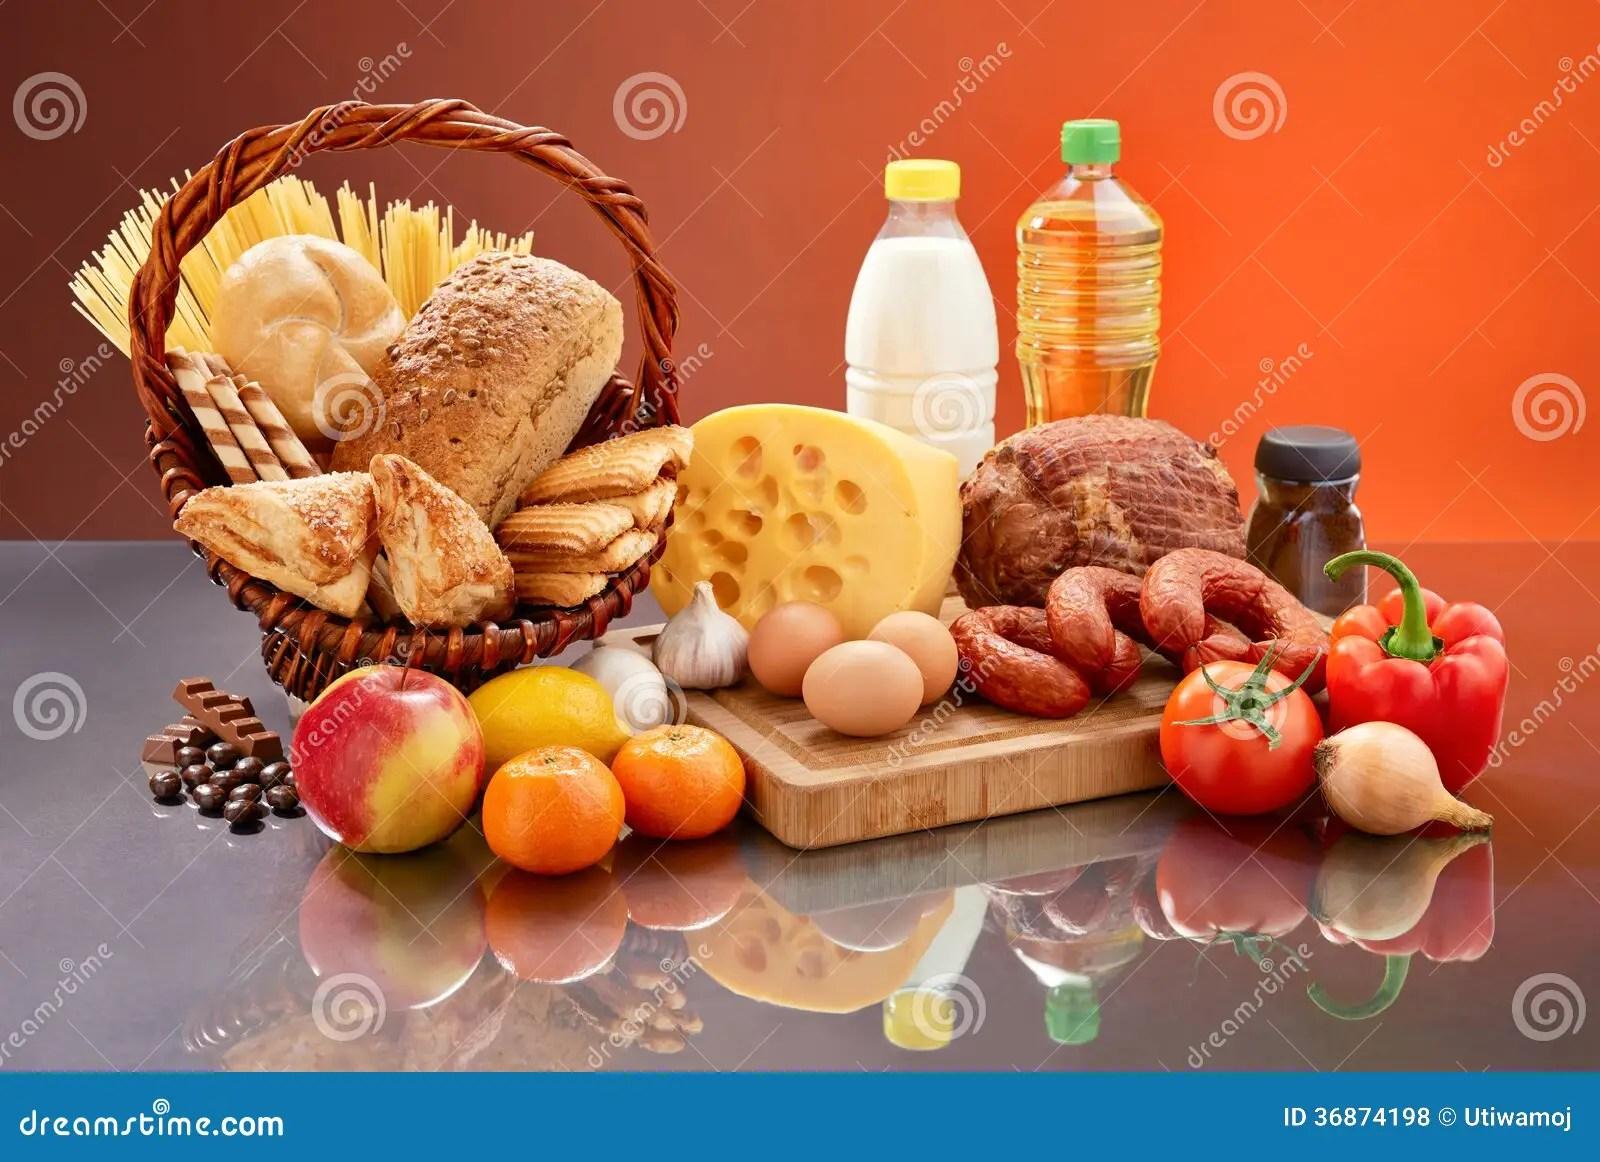 Daily Food Set Royalty Free Stock Photos Image 36874198